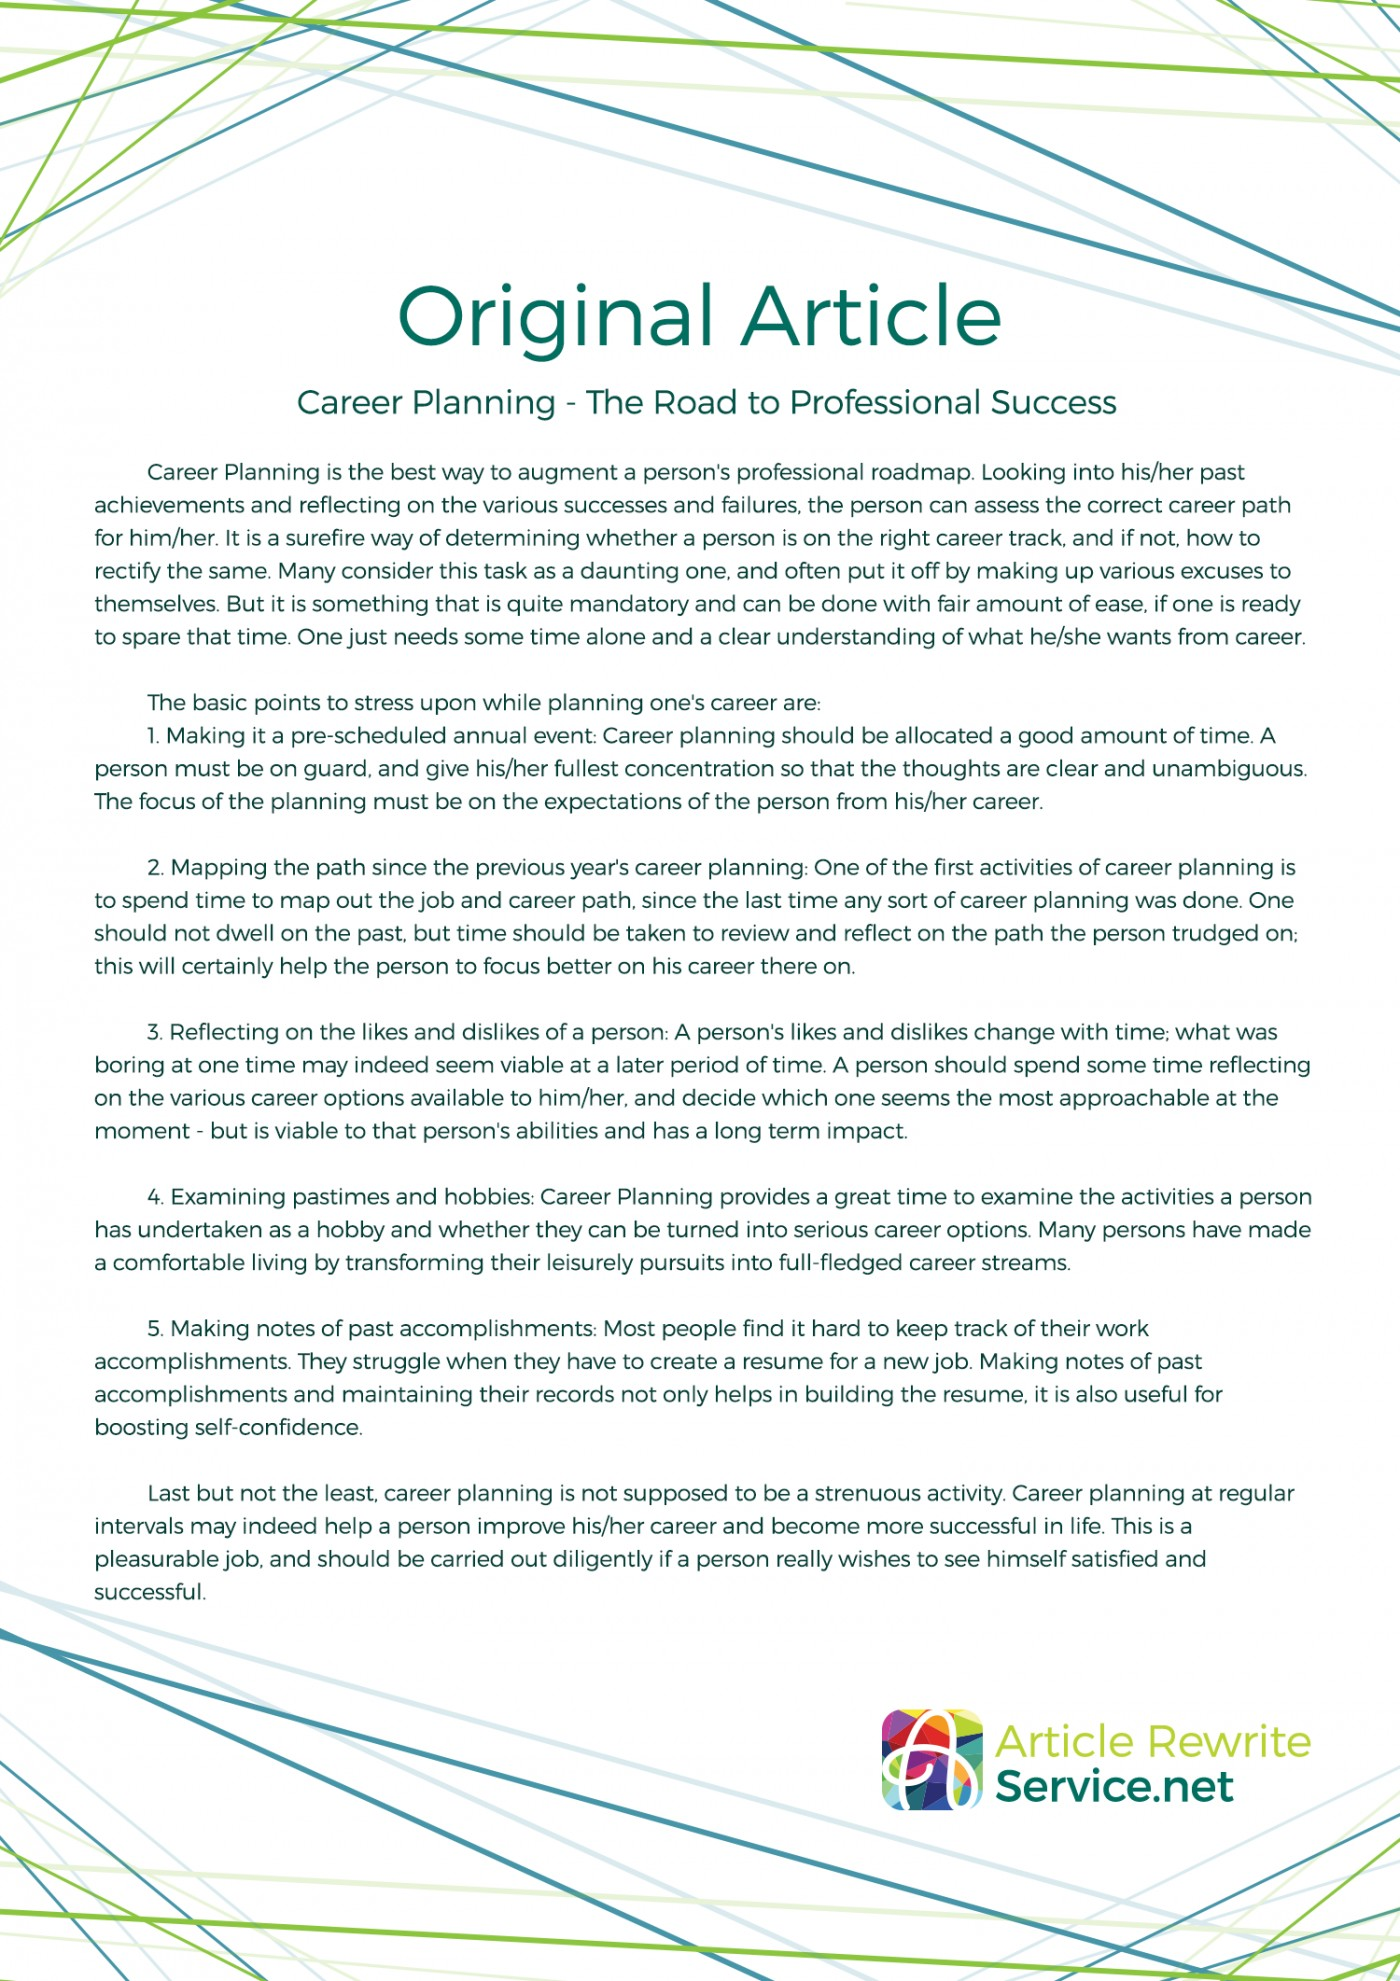 011 Essay Rewriter Articlerewriteservice Before Sample Singular Free Software Crack Generator 1400